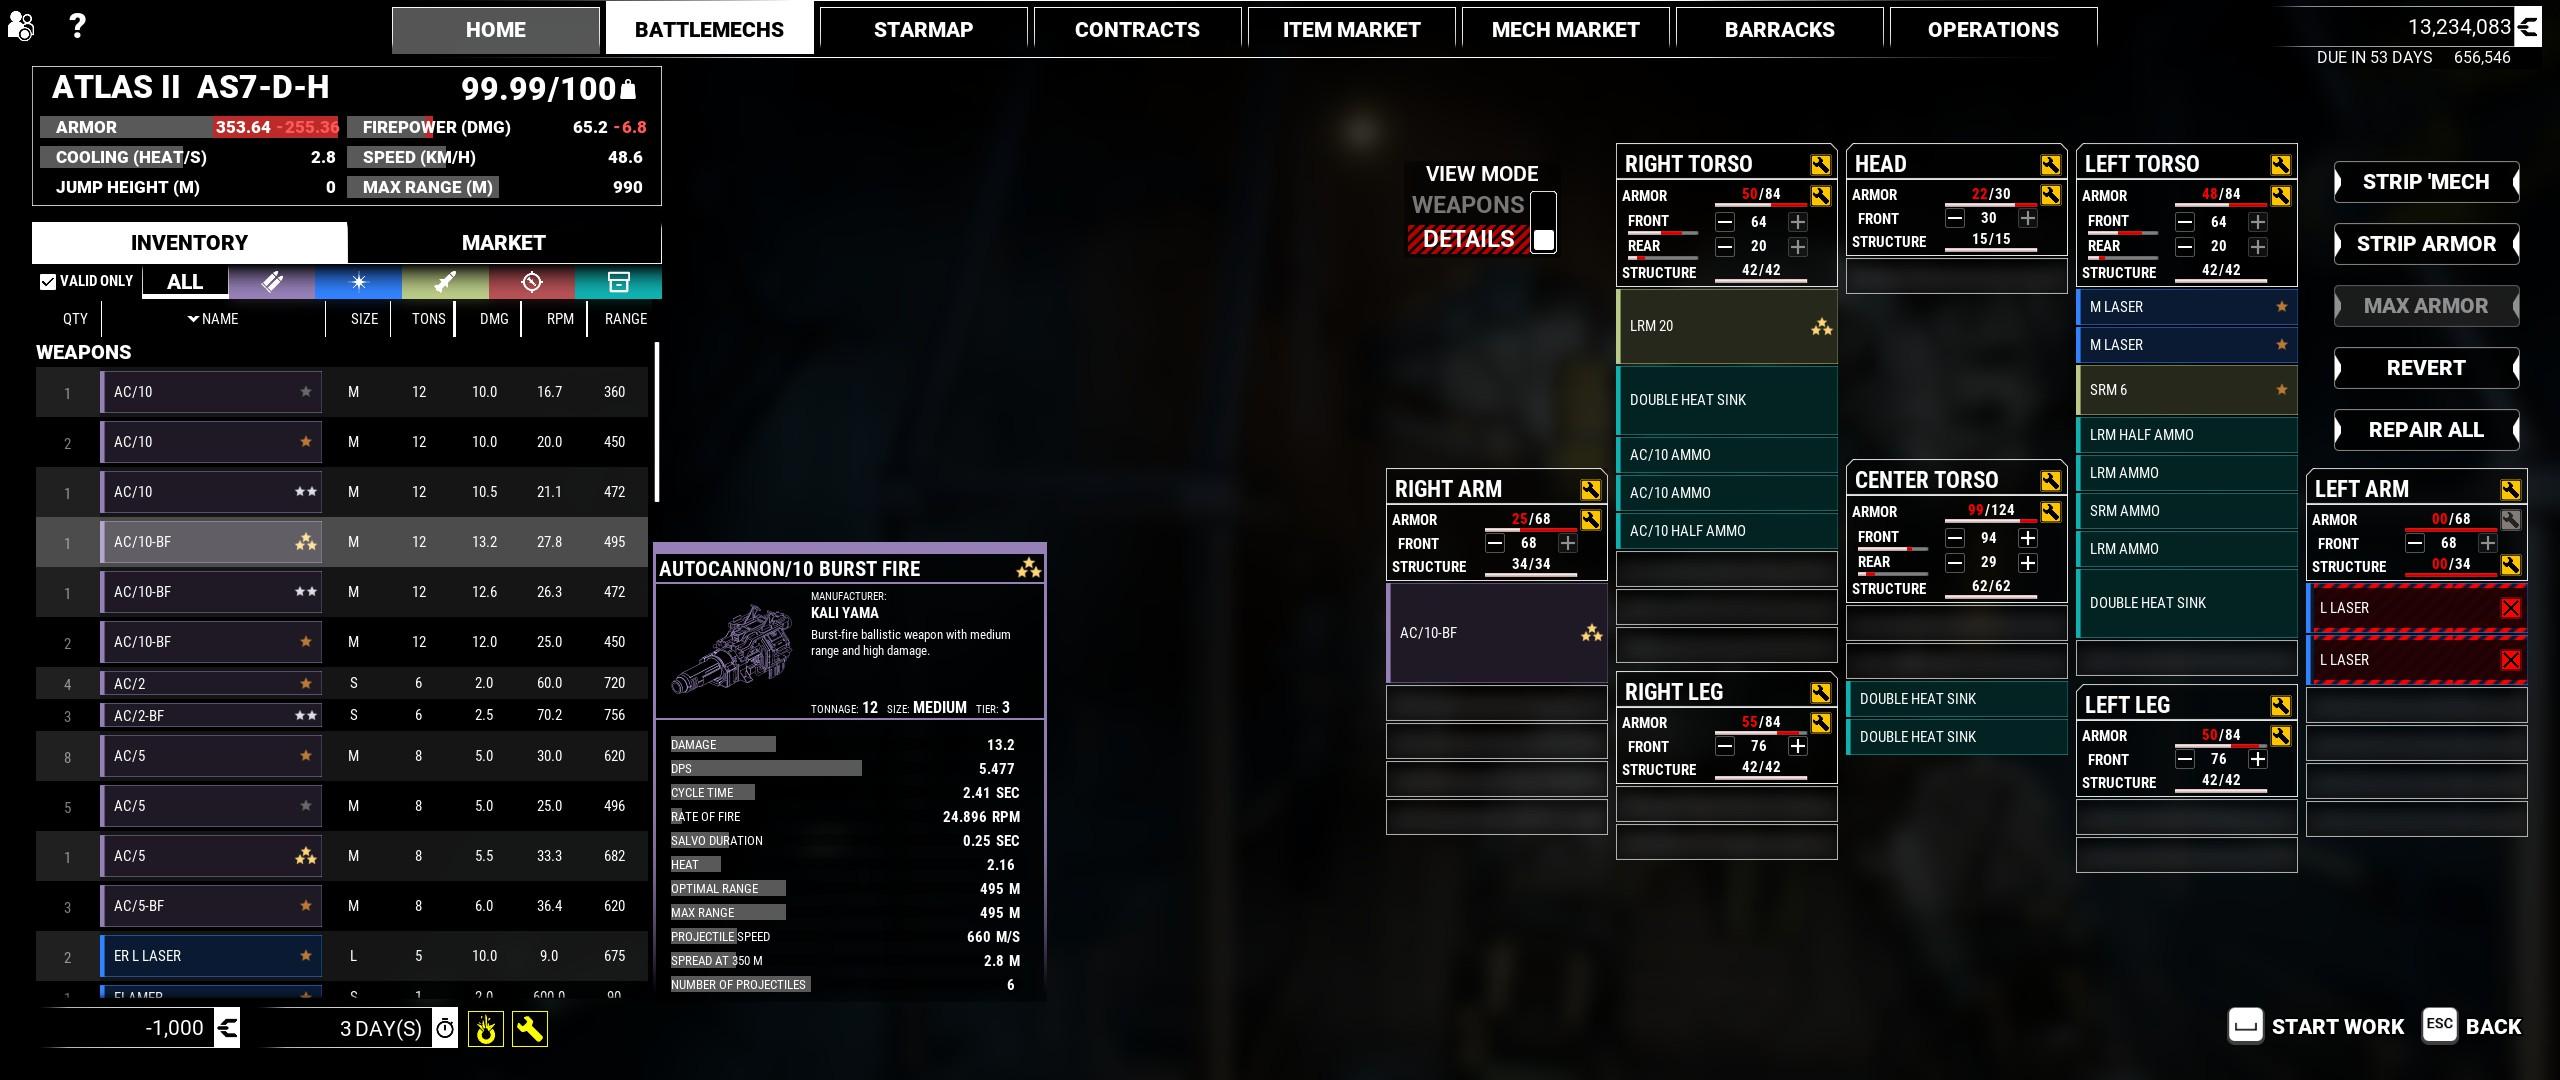 MechWarrior 5: Mercenaries List of Mods in Game + Links Download - [Cosmetic Mods 3] - B765795